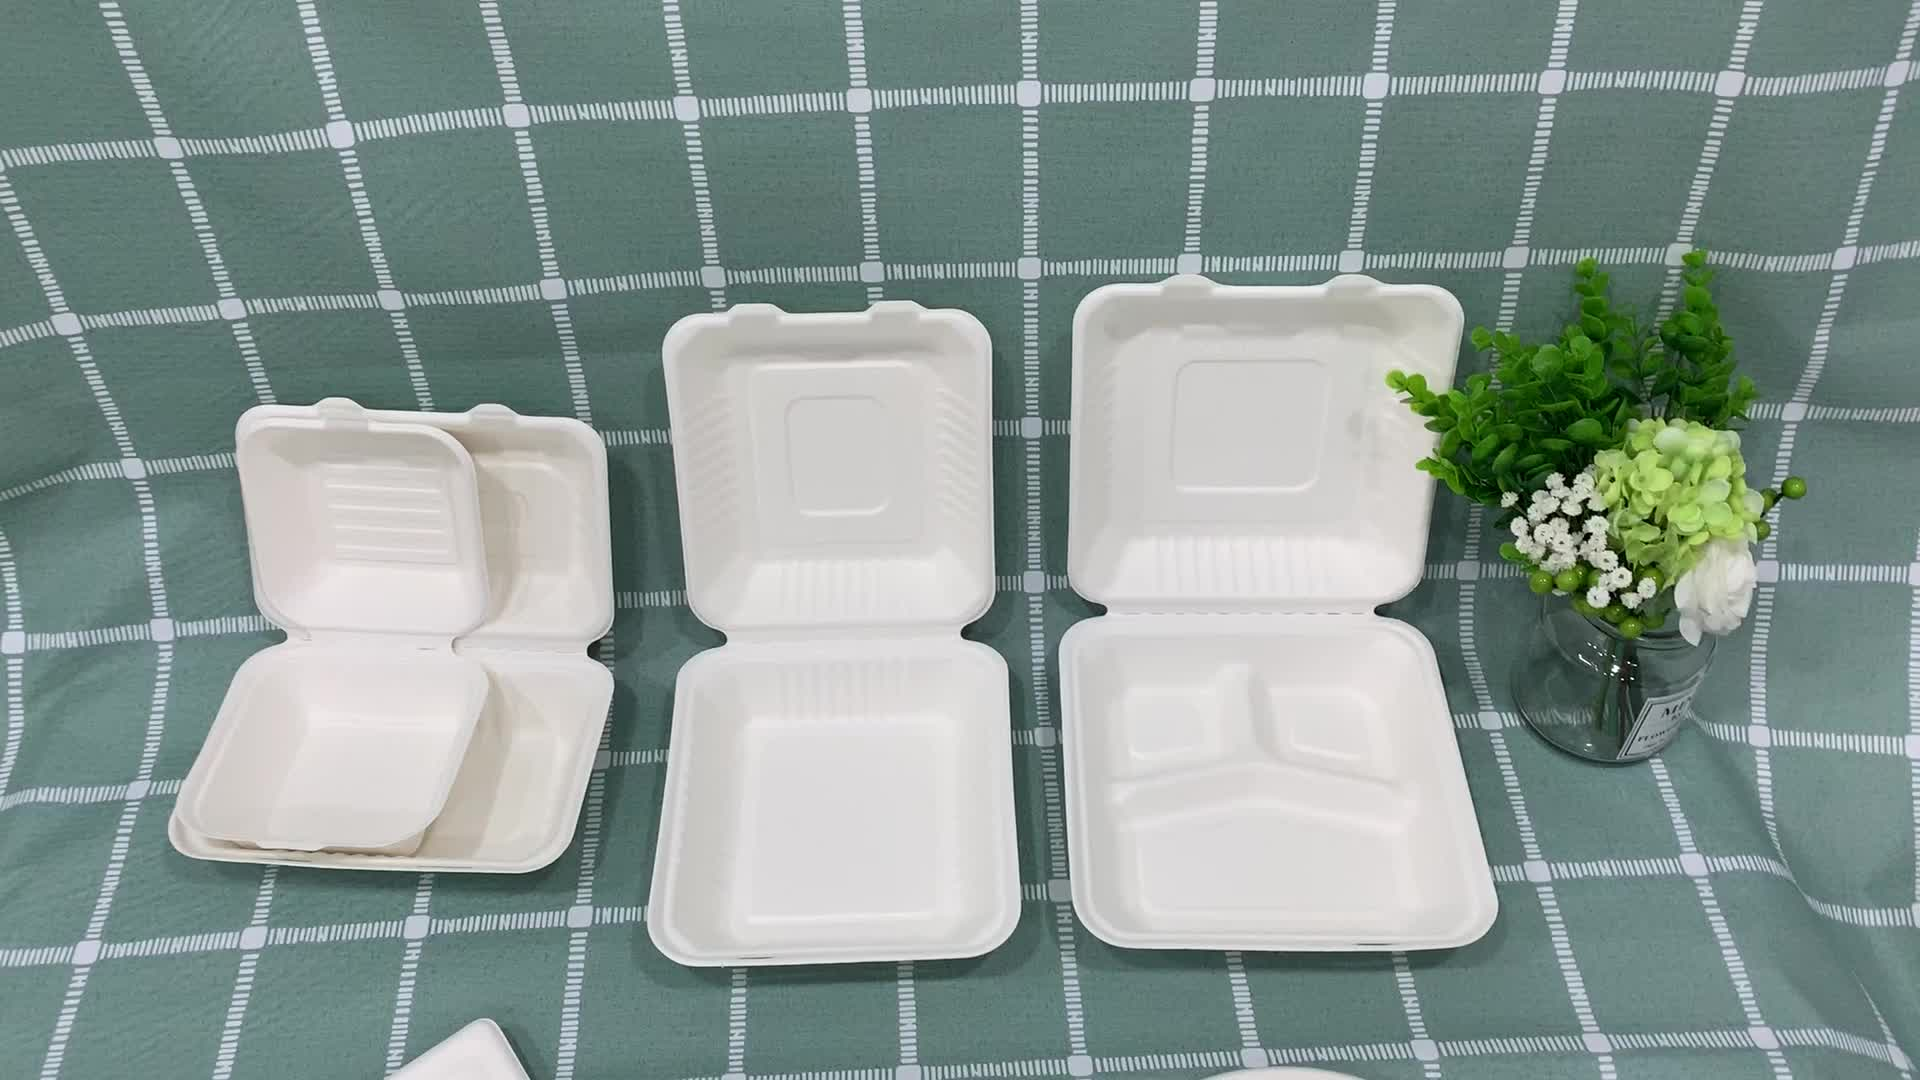 6 Inch eco friendly biodegradable bamboo take away dinnerware sets disposable sugarcane bagasse burger clamshell food box